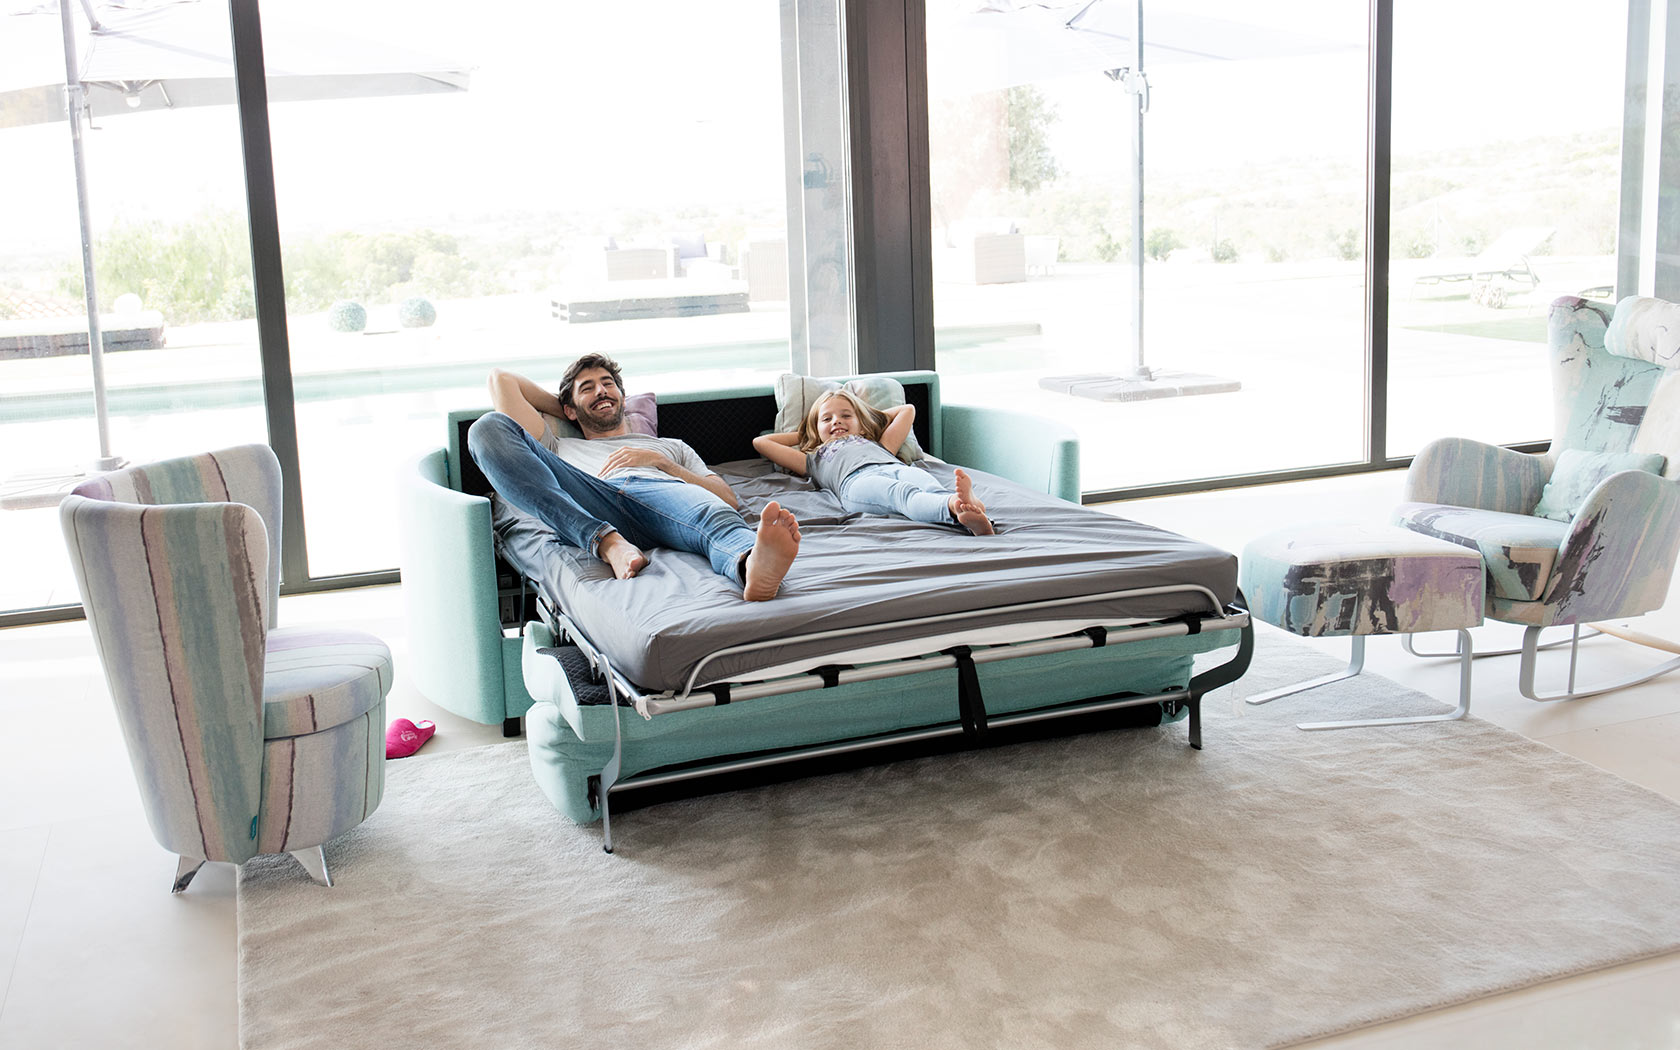 Bolero sofa cama 2019 04